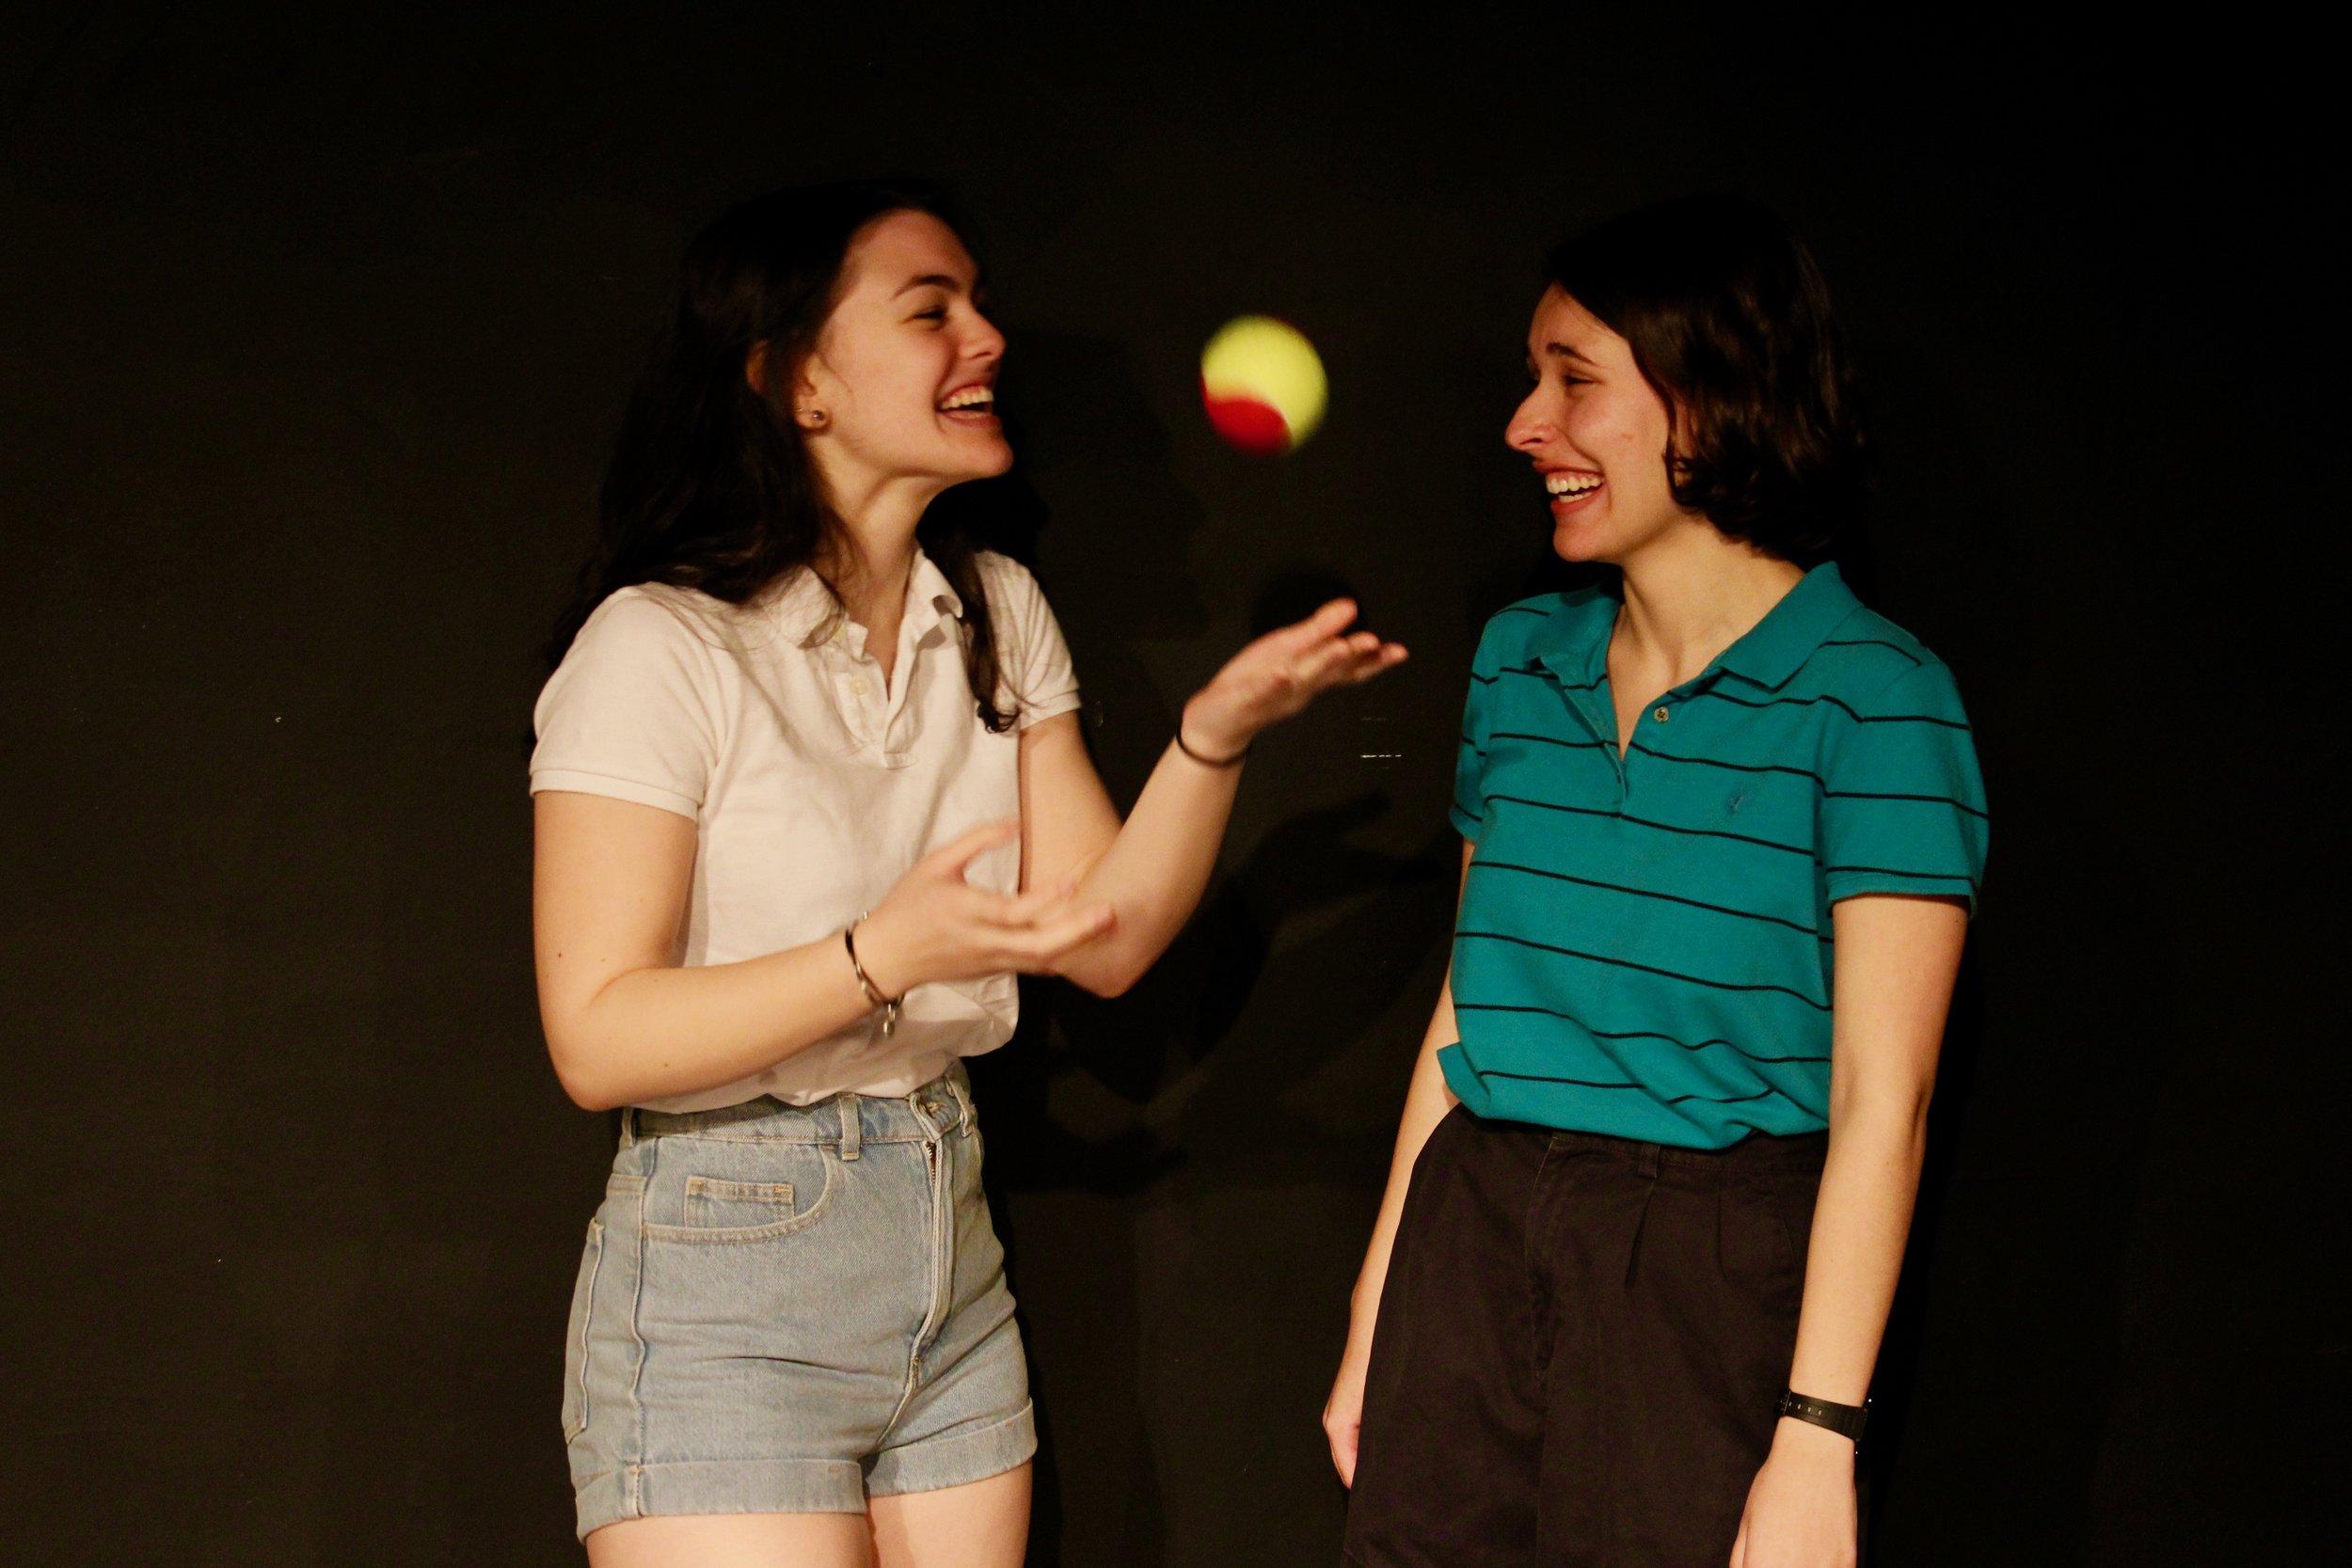 From left: Casey Rae Borella as Kiki, Katie Kunka as Loony